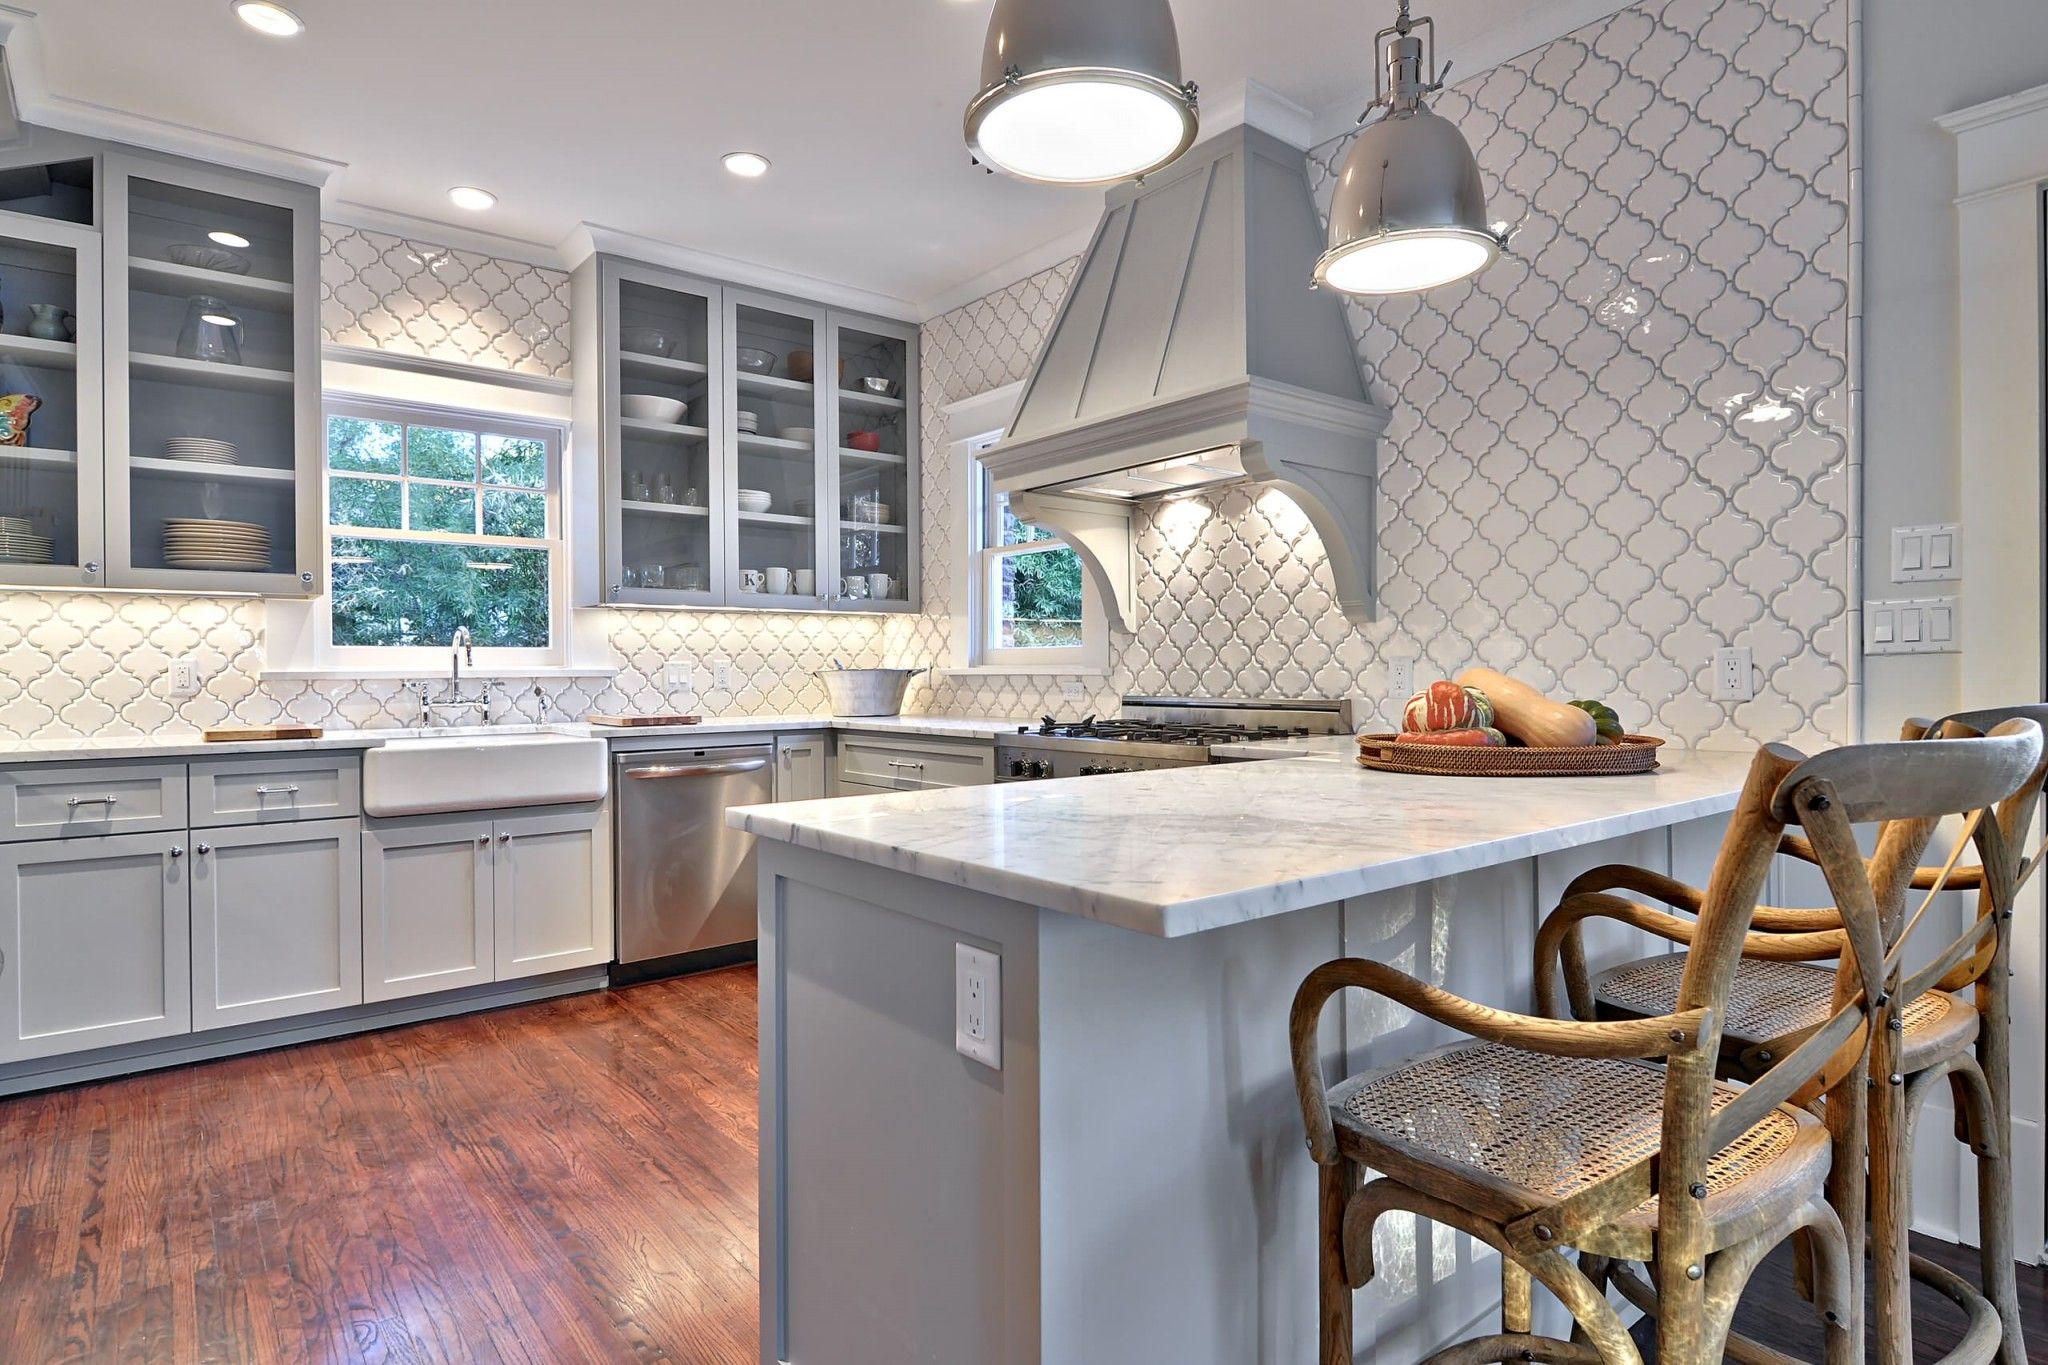 tiles kitchen furniture accounted kitchen kitchen wall tiles texture kitchens